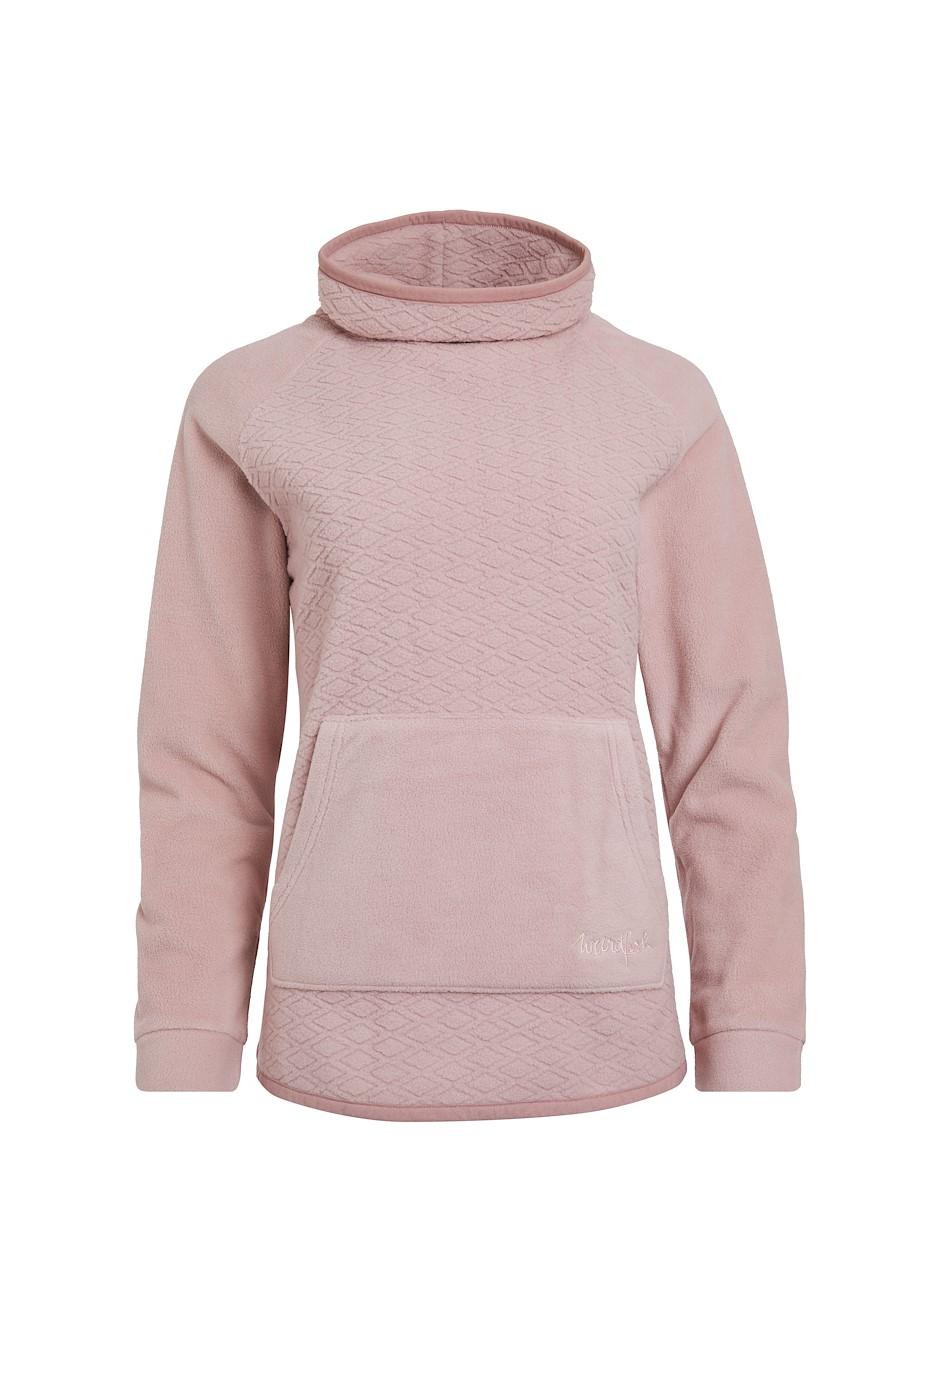 Sallca Recycled Polyester Micro Fleece Powder Pink